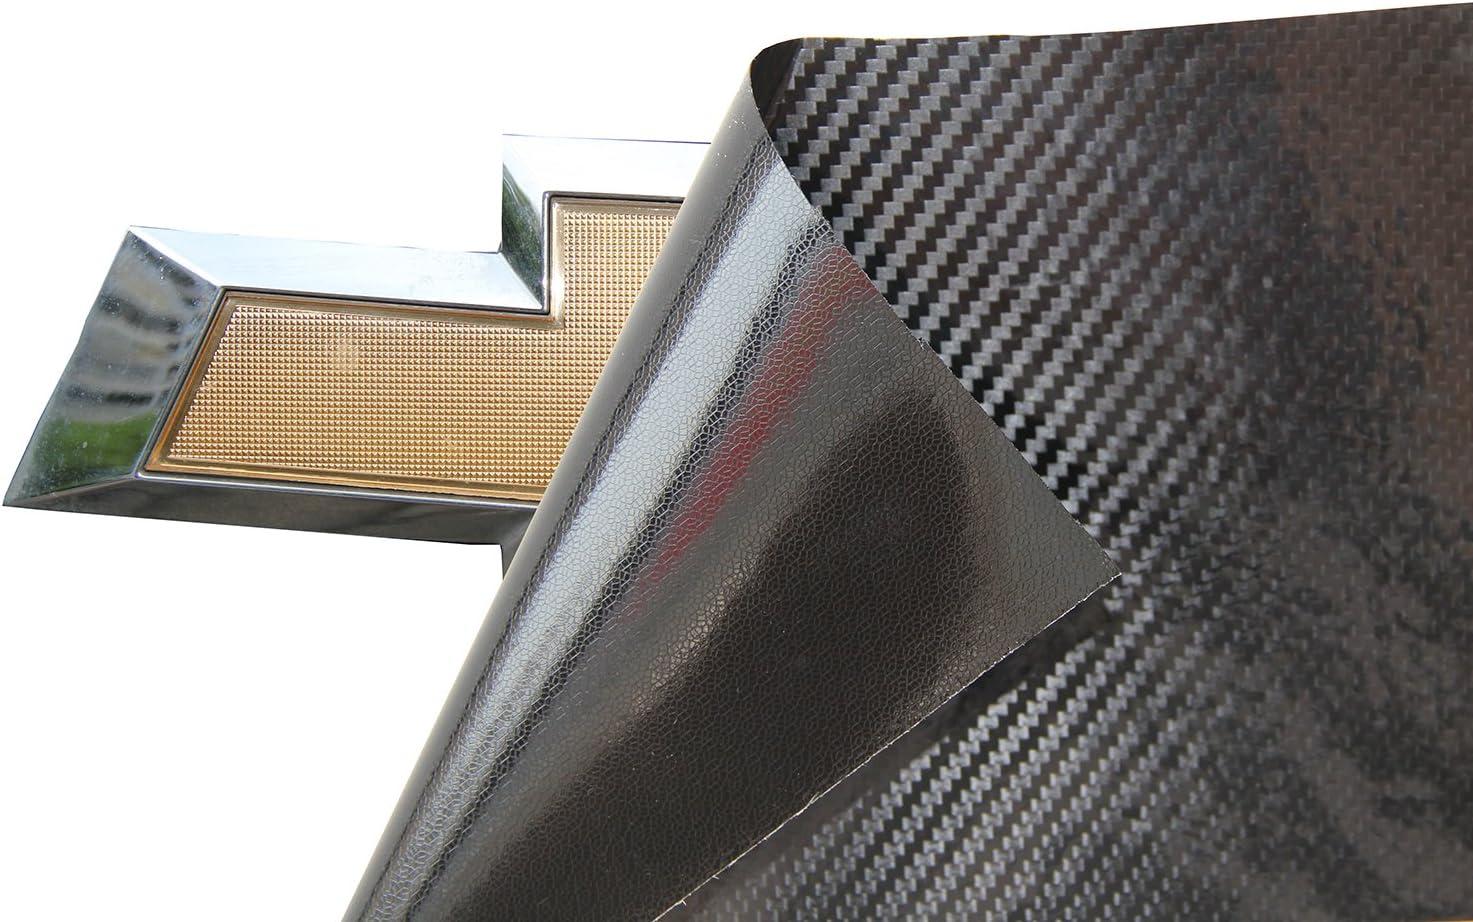 LZLRUN Bowtie Logo Wrap Sticker for Chevy Carbon Fiber Cut-Your-Own Emblem Overlay DIY Decal 4PCS